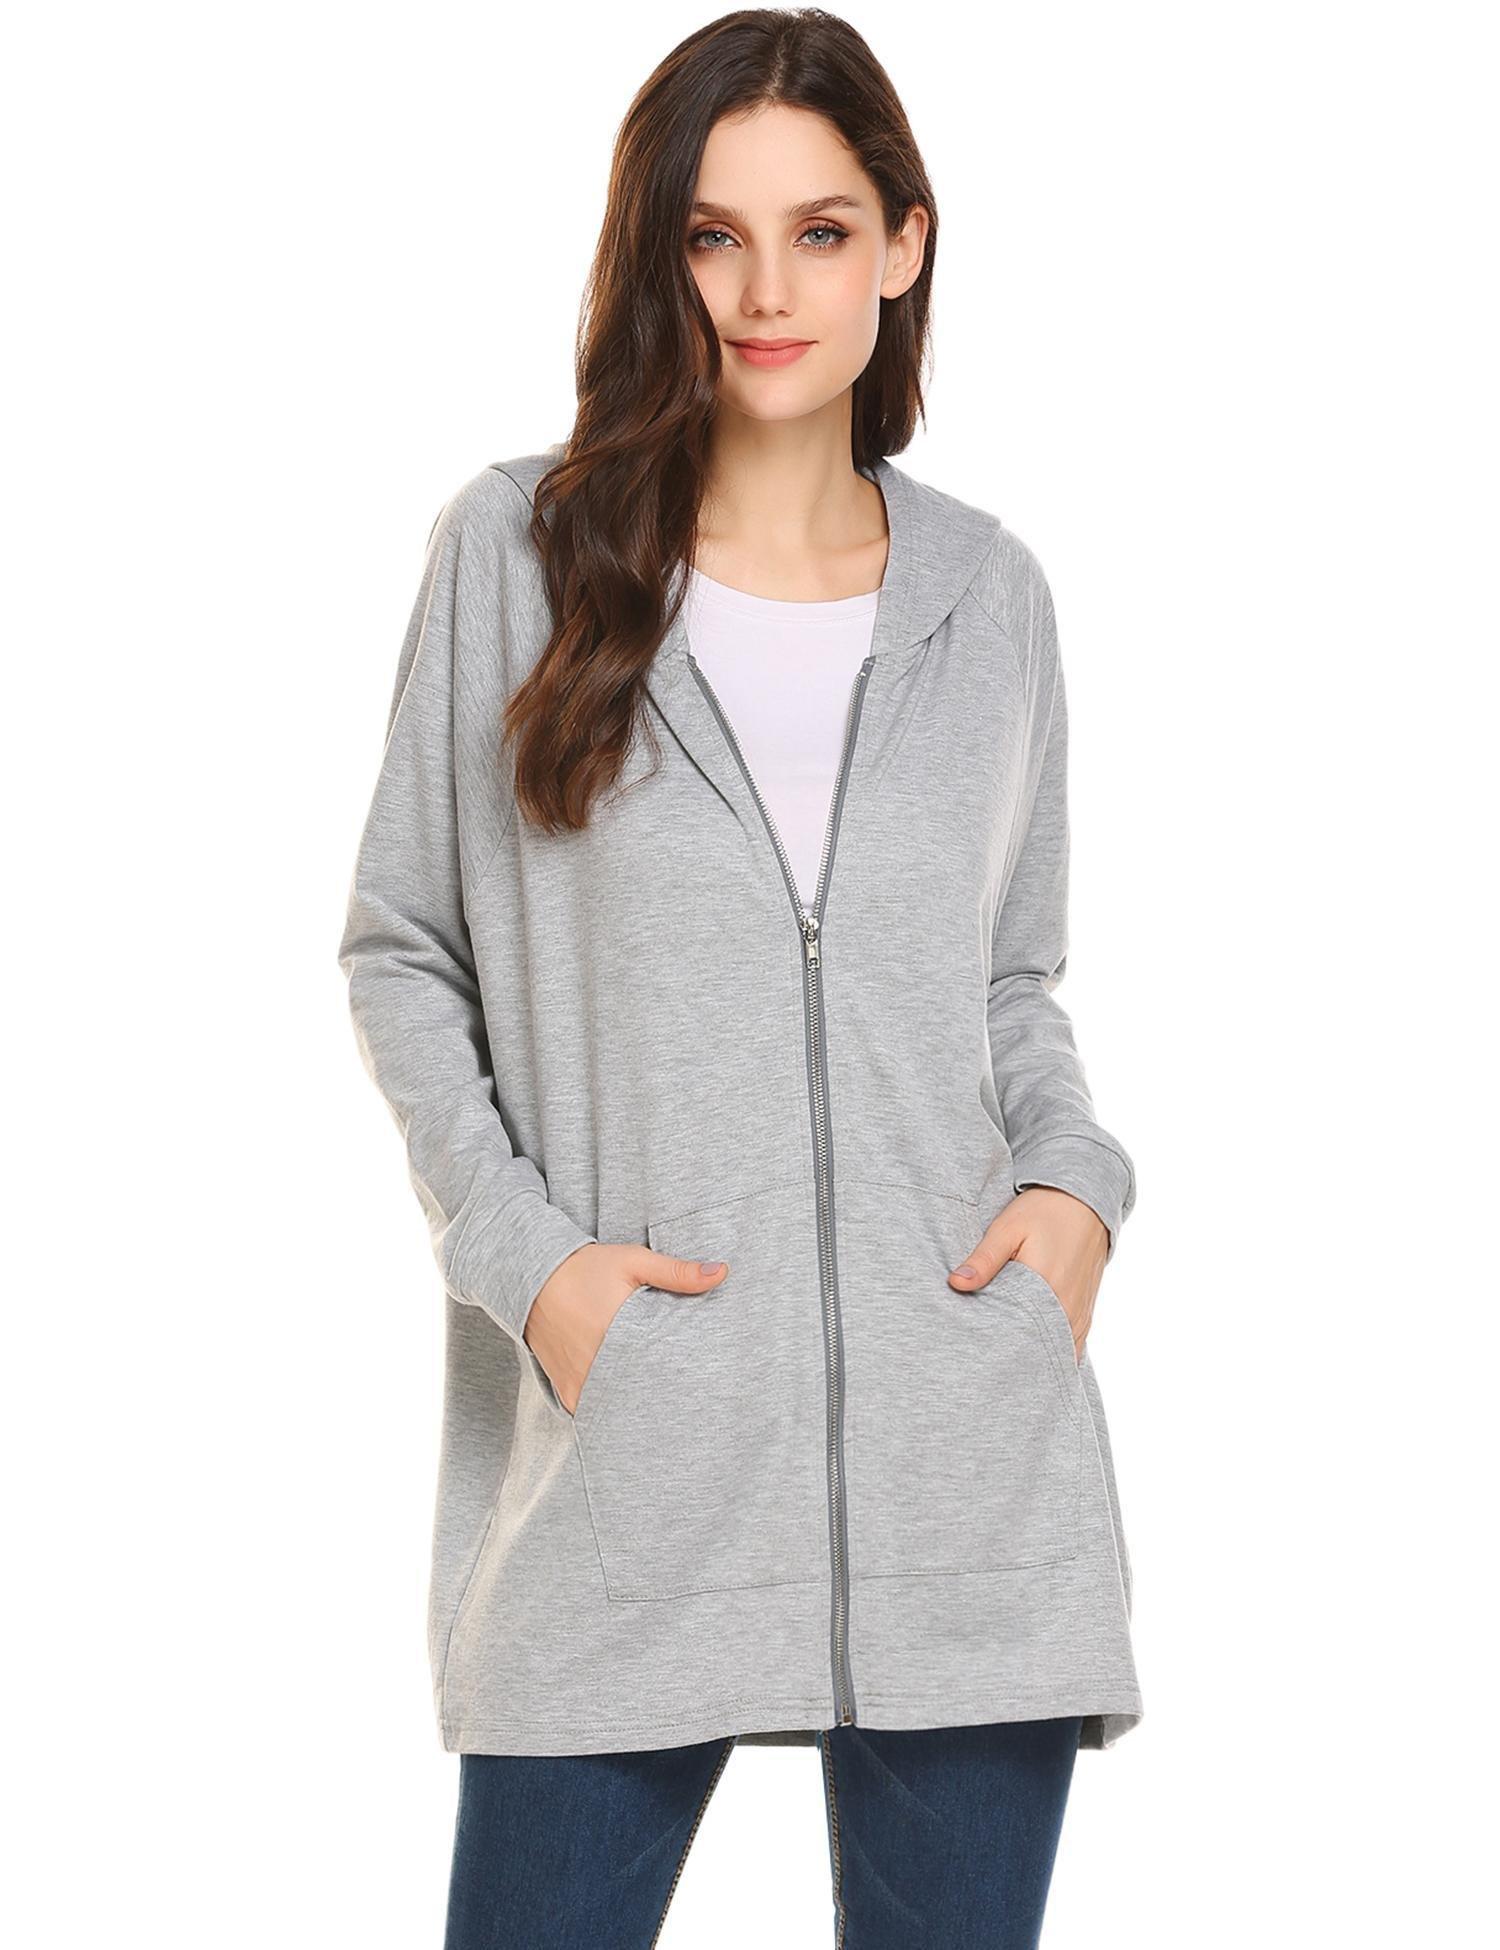 Zeagoo Women's French Terry Full-Zip Long Raglan Sleeve Hoodie Sweatshirt Gray Medium